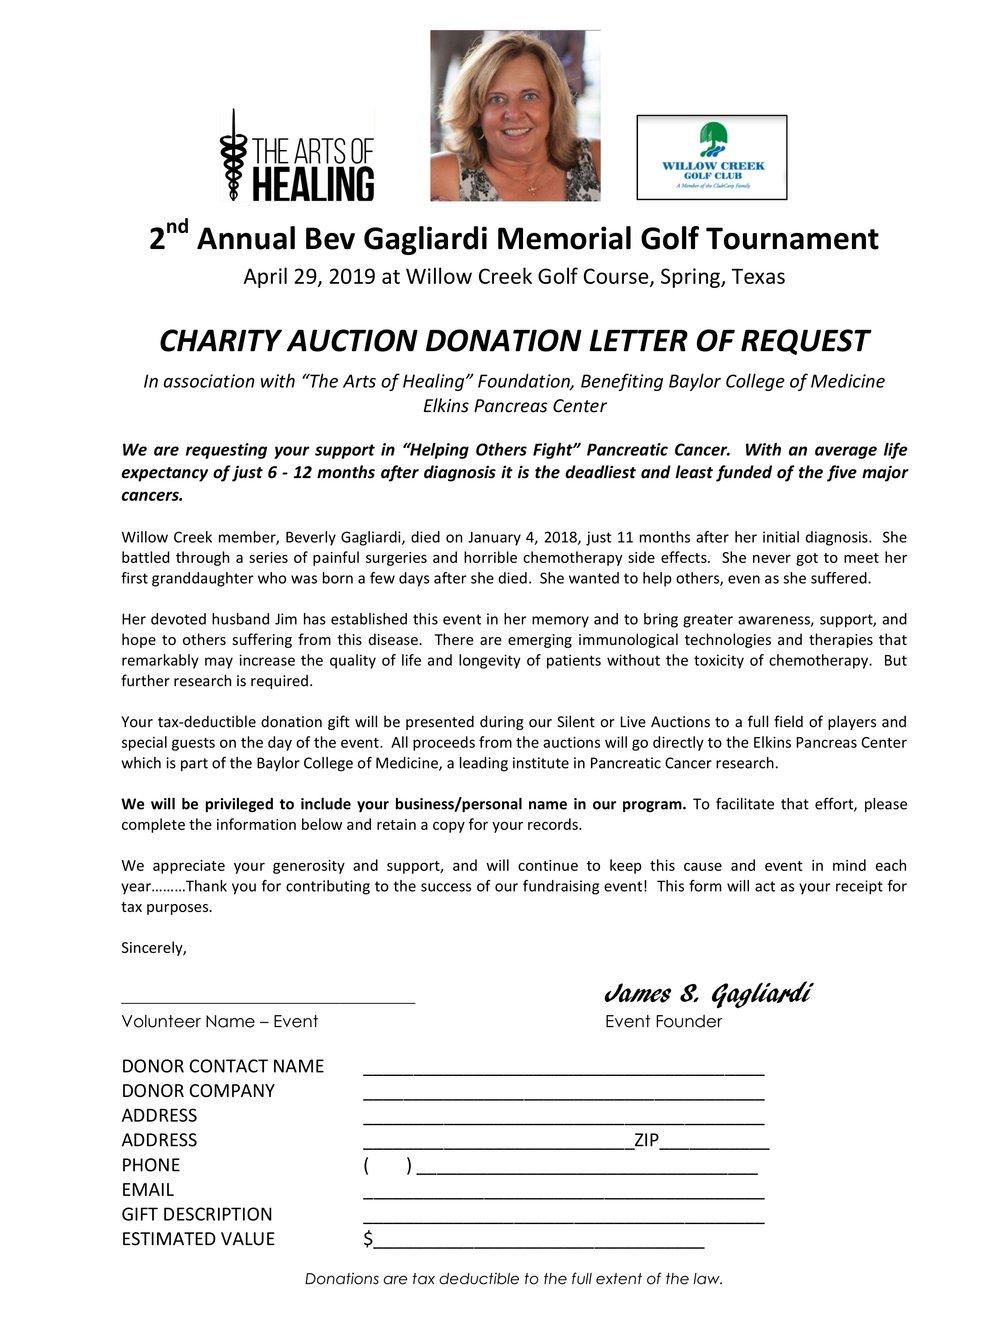 Bev Gagliardi Tournament Donations Request Letter (042919).jpg